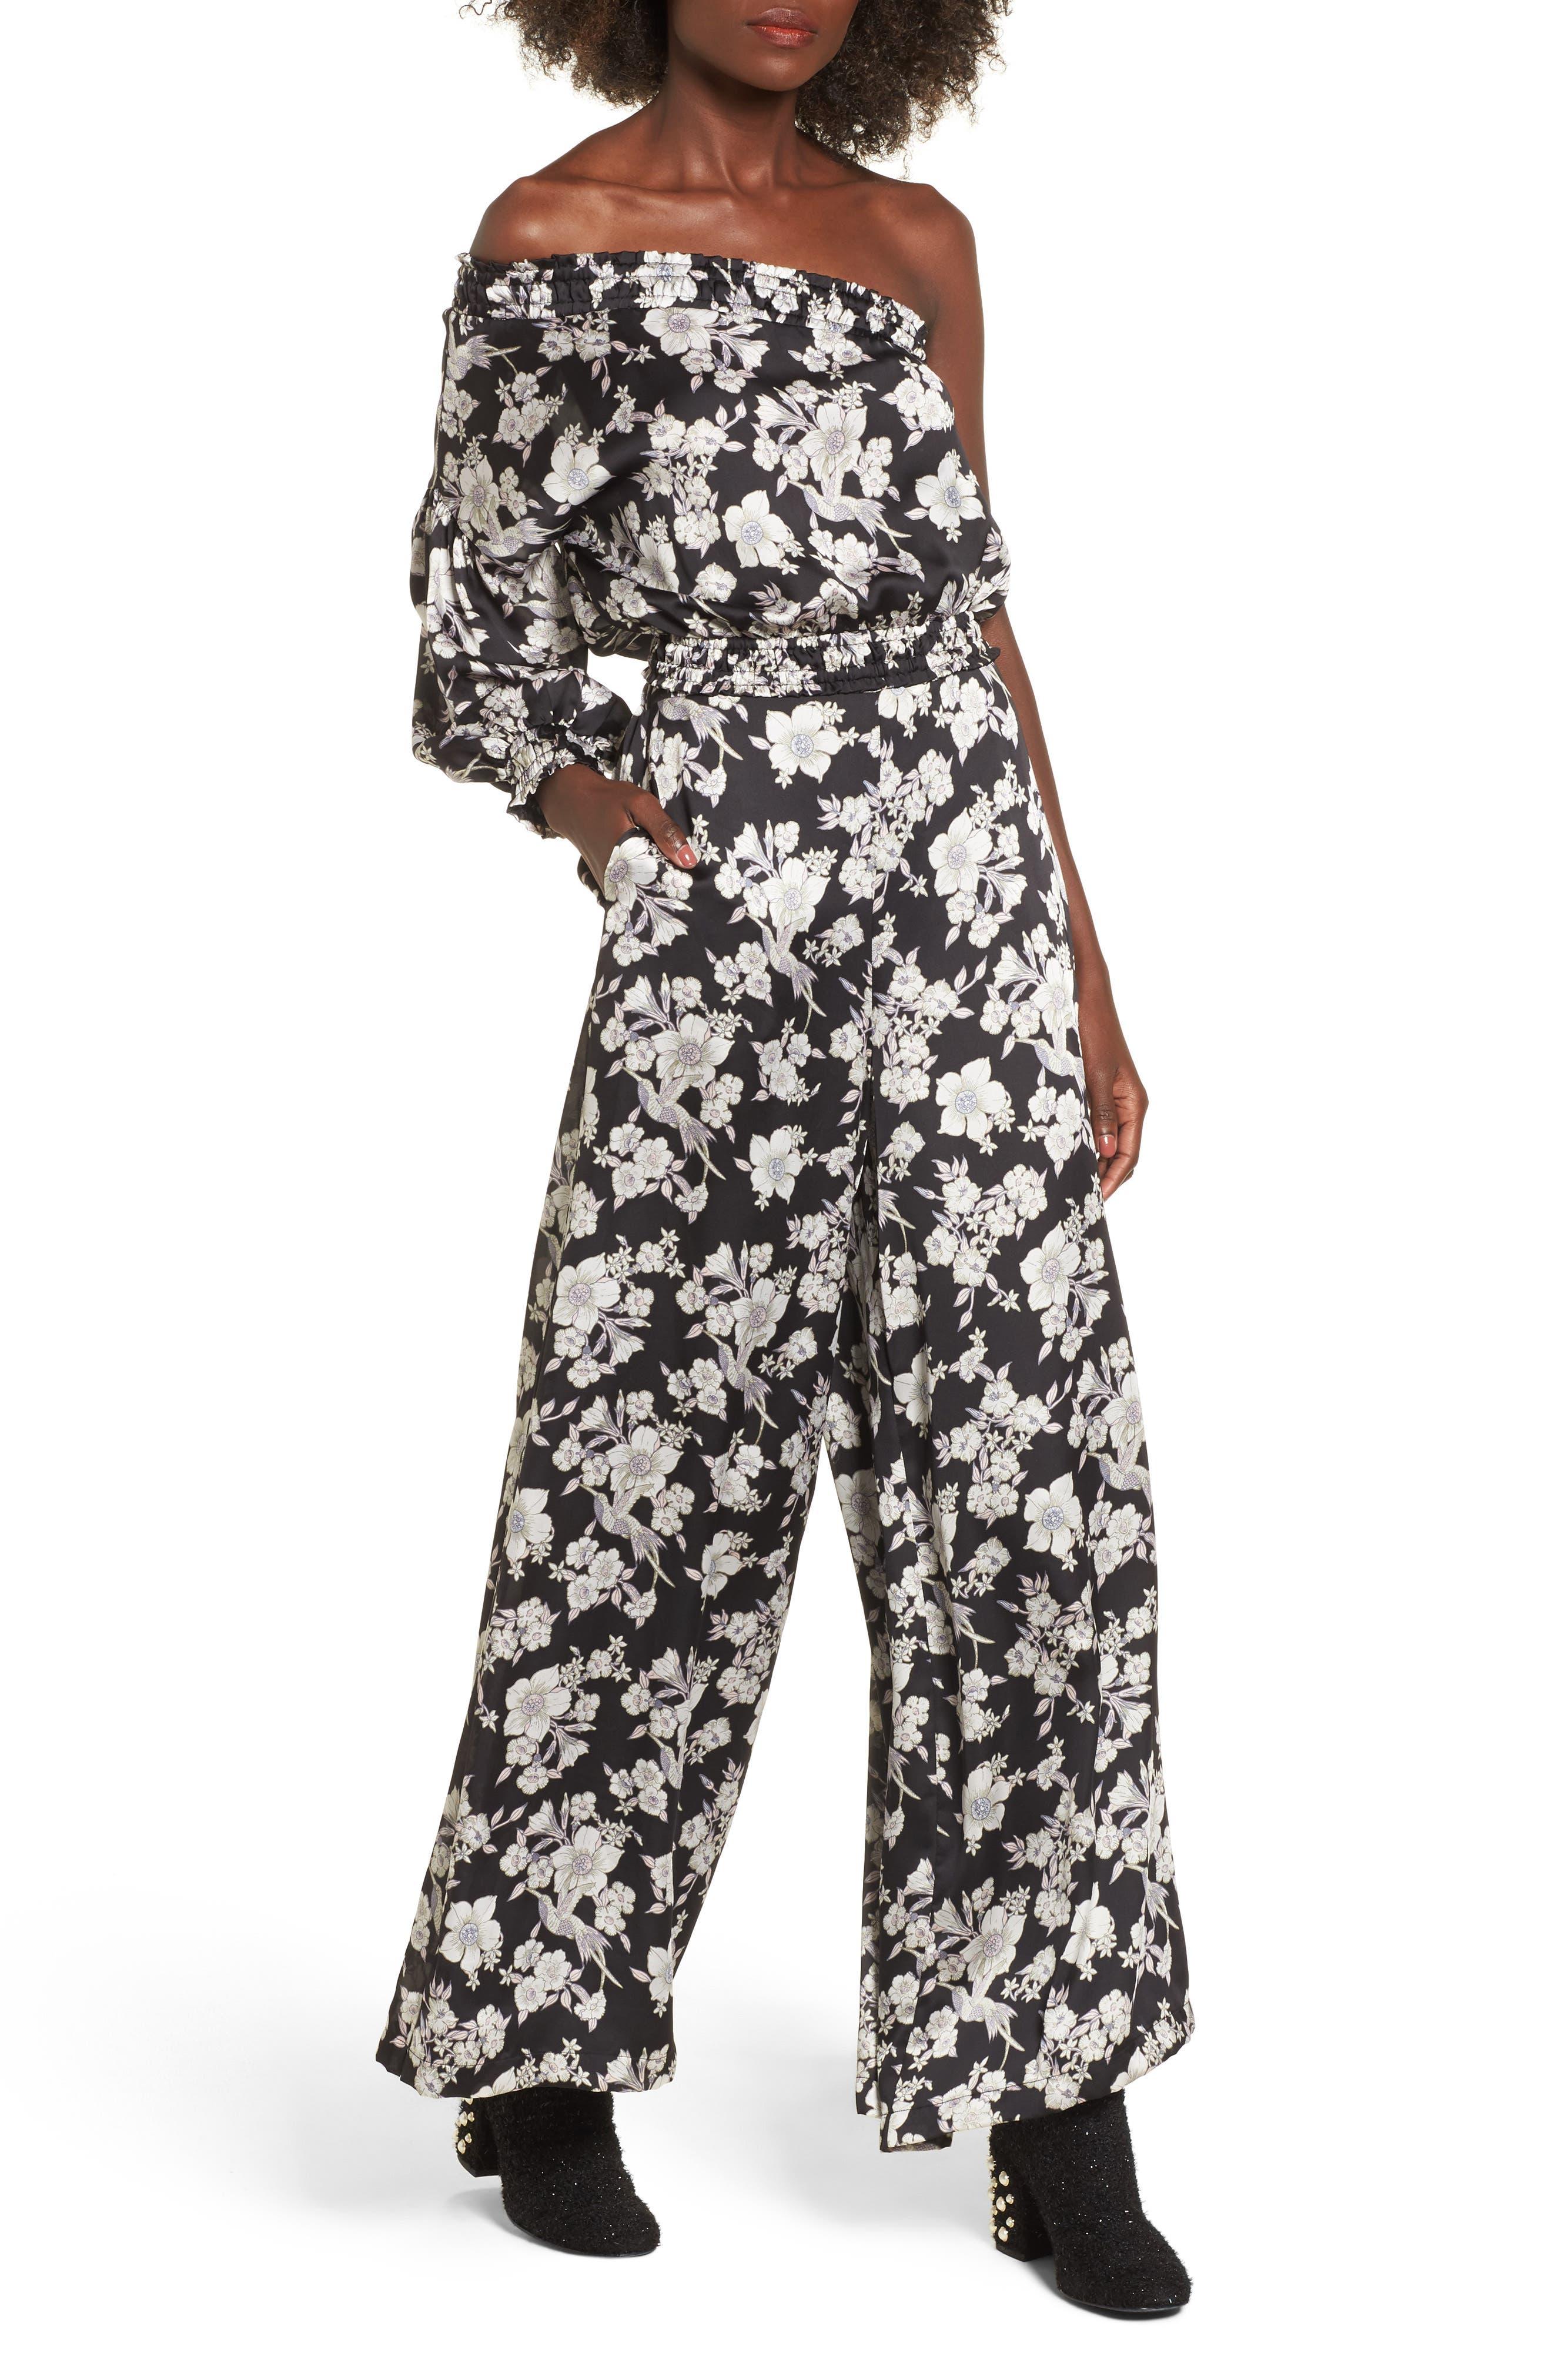 Birdee Wide Leg Pants,                             Alternate thumbnail 2, color,                             Black Floral